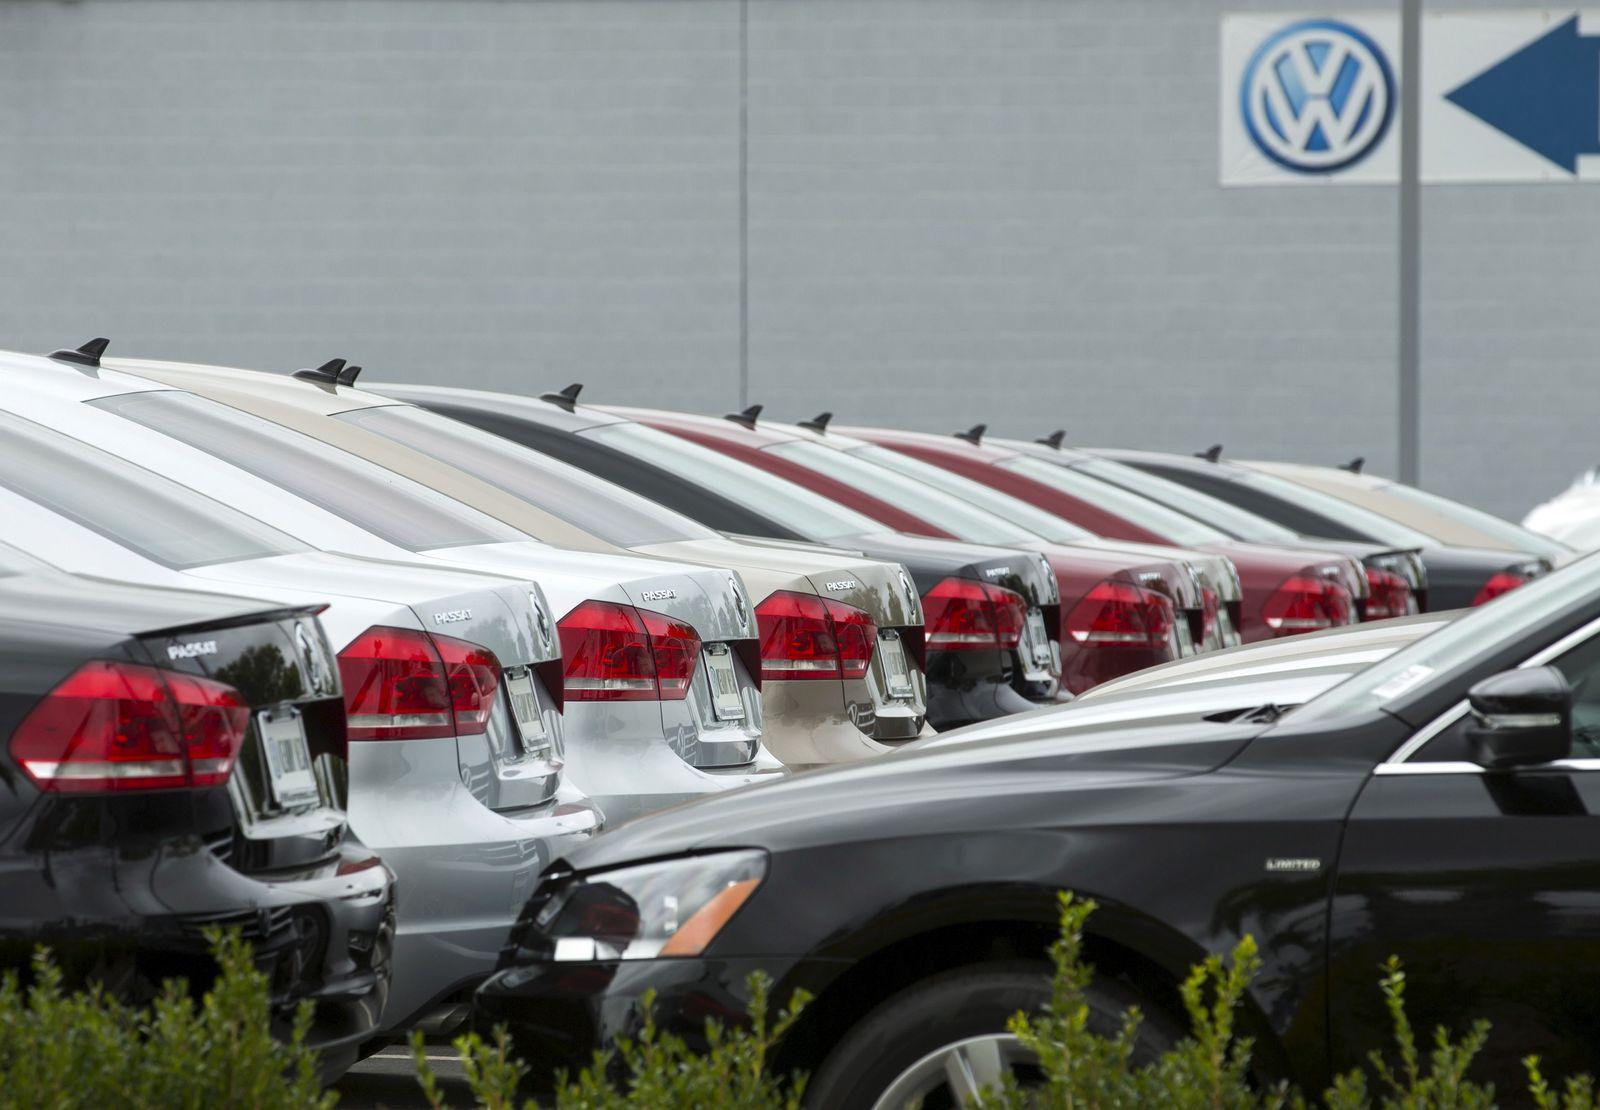 VW / Autohändler / USA